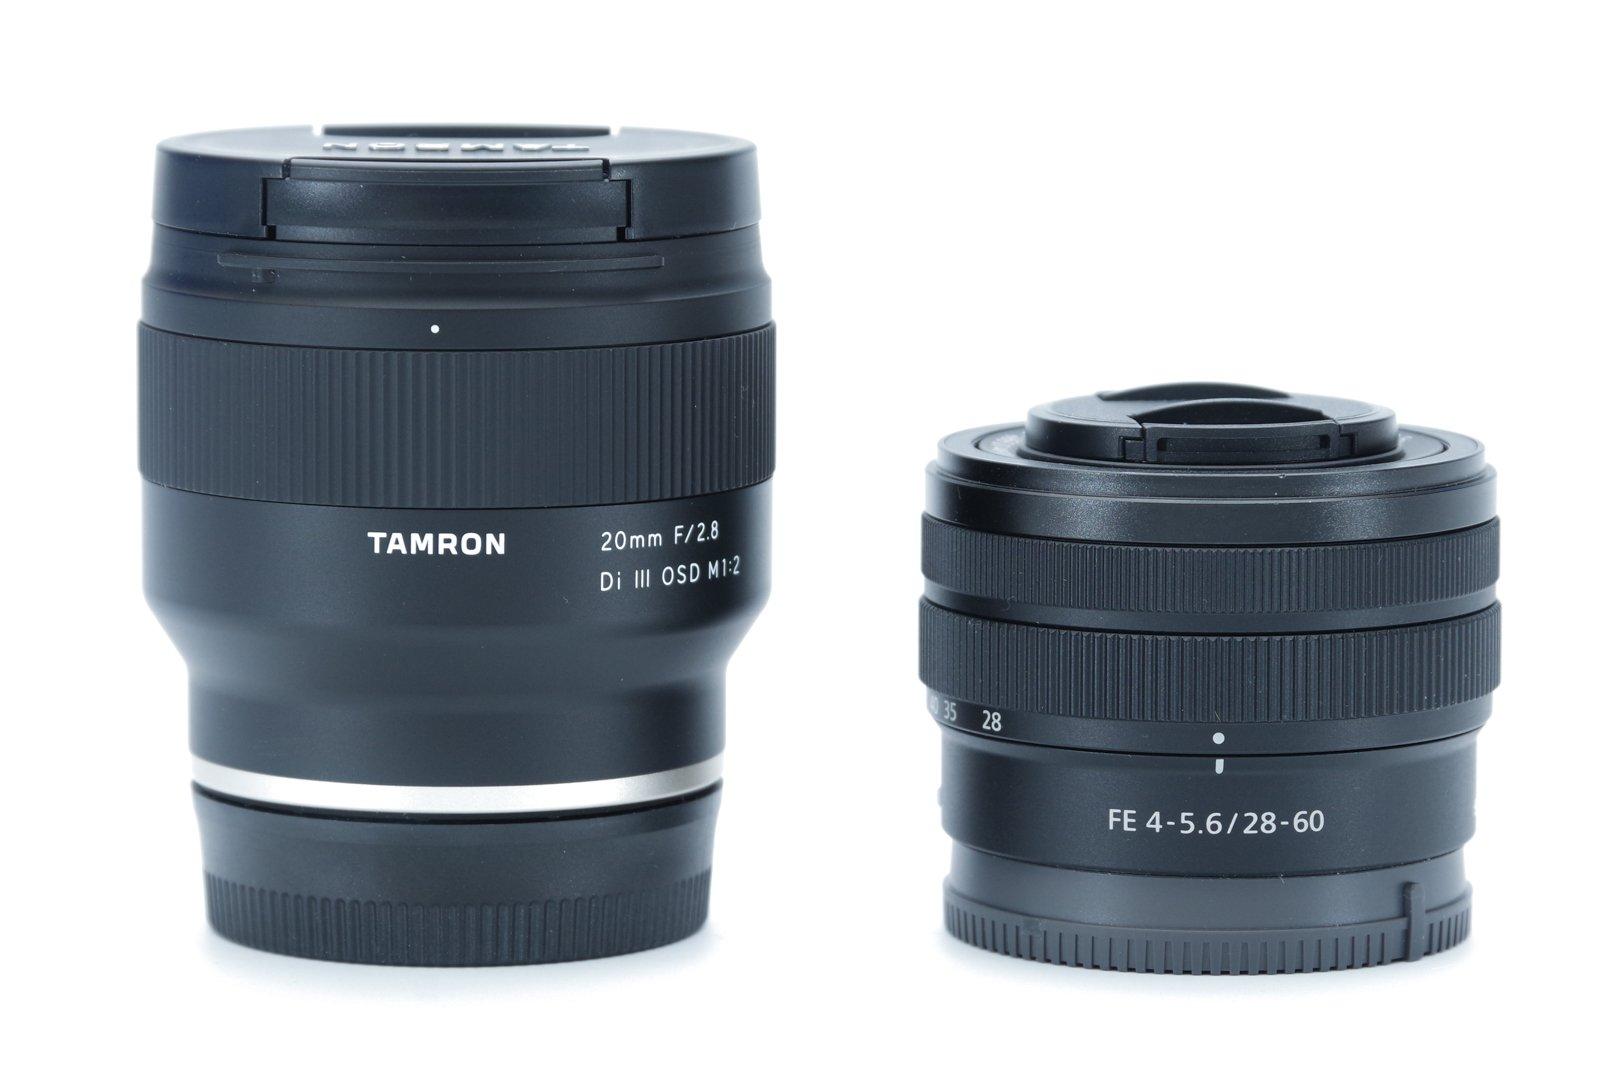 Tamron 20mm F2.8 vs Sony FE 28-60mm